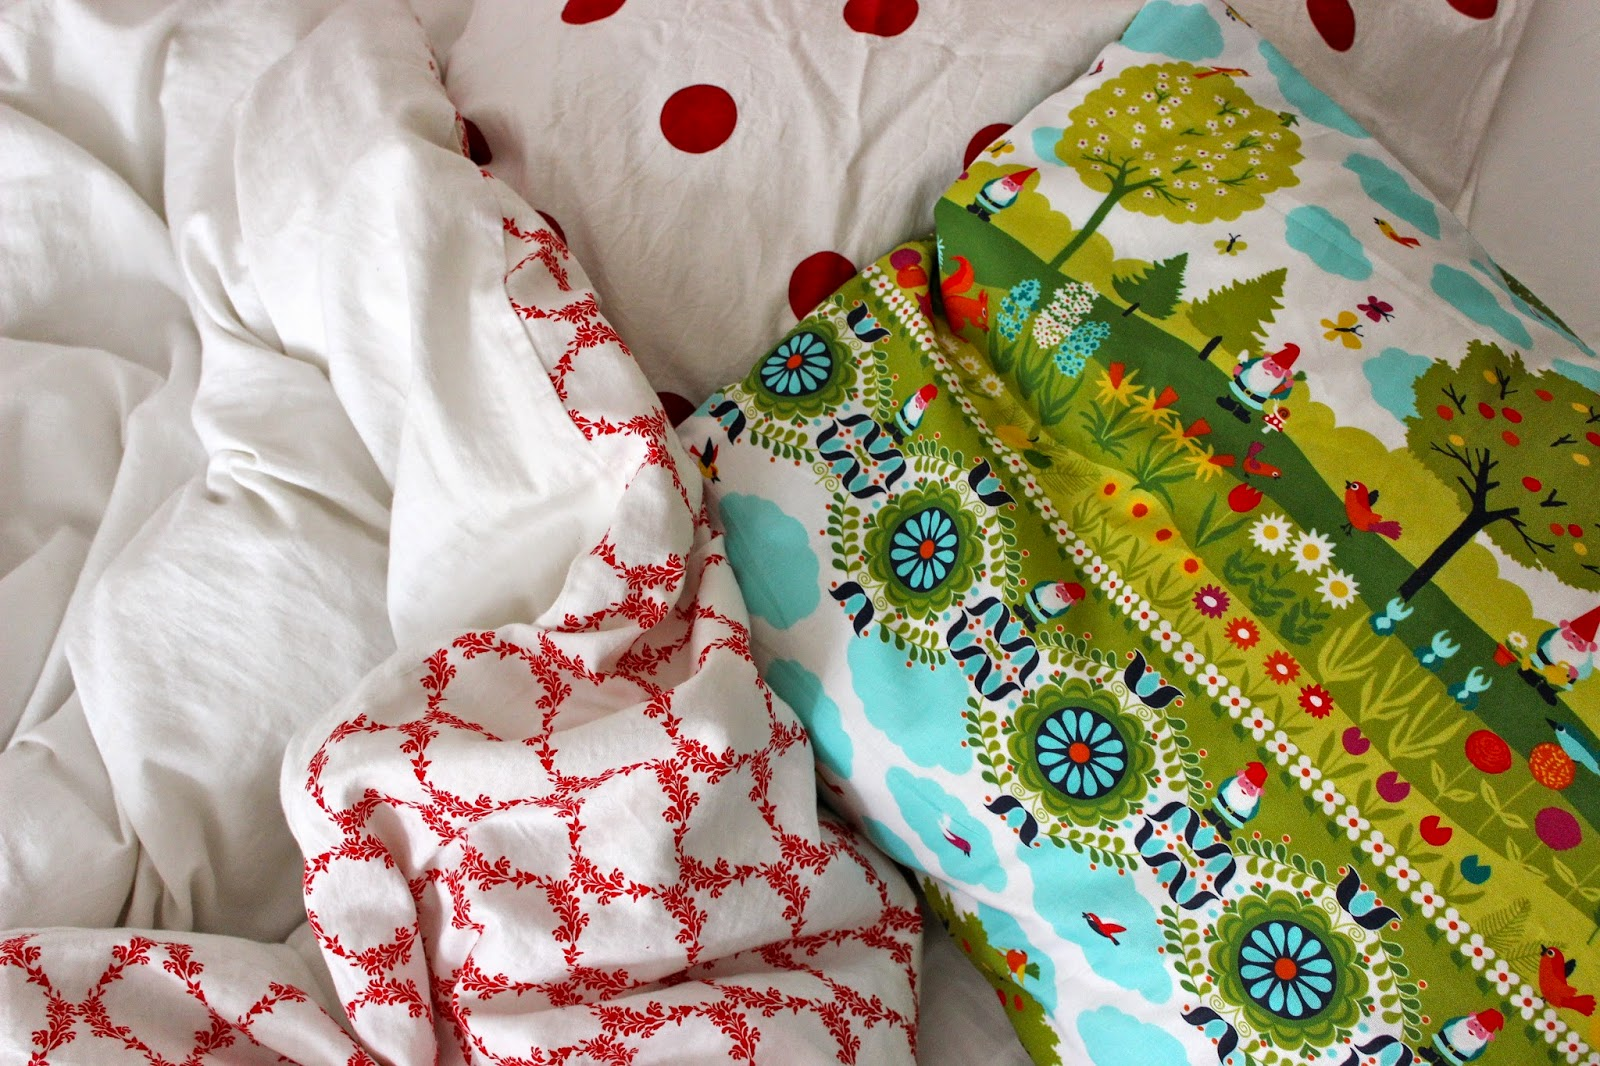 freuleinmimi schlaf gut dorma bain. Black Bedroom Furniture Sets. Home Design Ideas